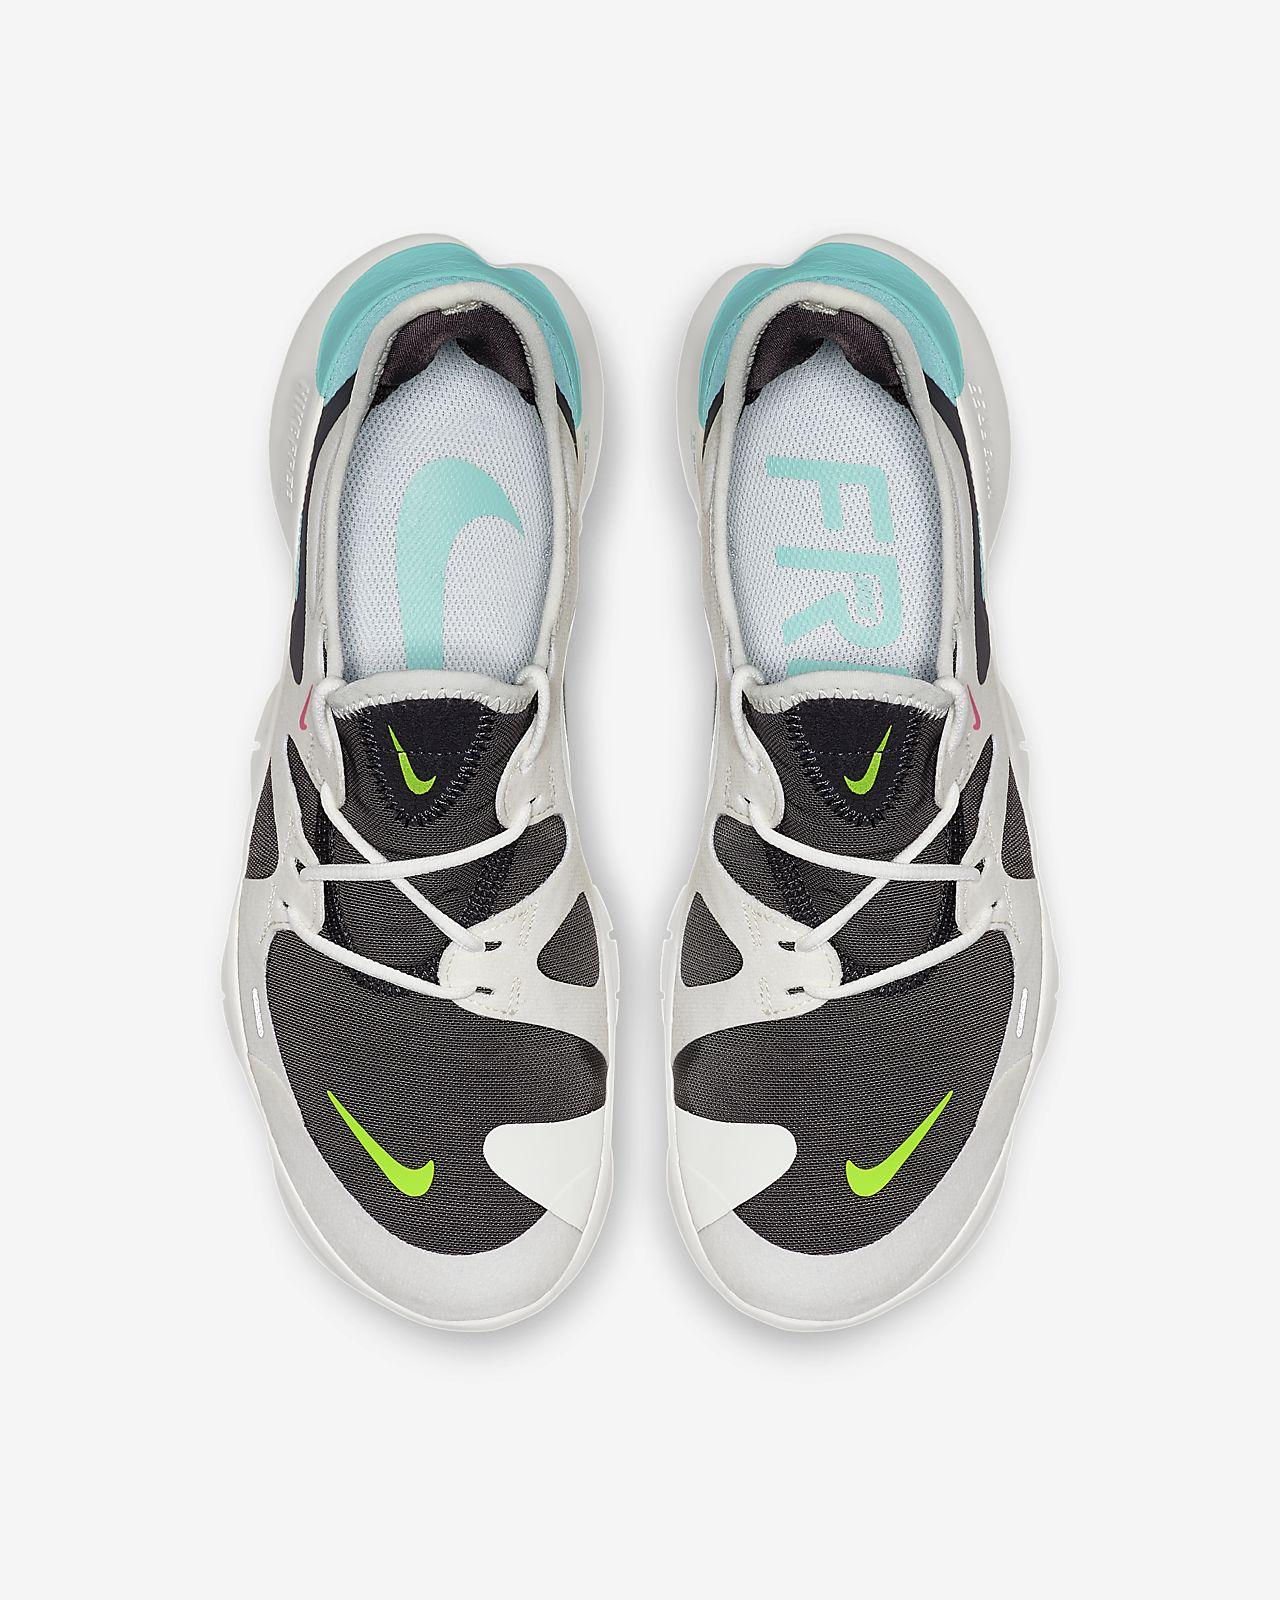 b5b276a8 Calzado de running para mujer Nike Free RN 5.0. Nike.com MX